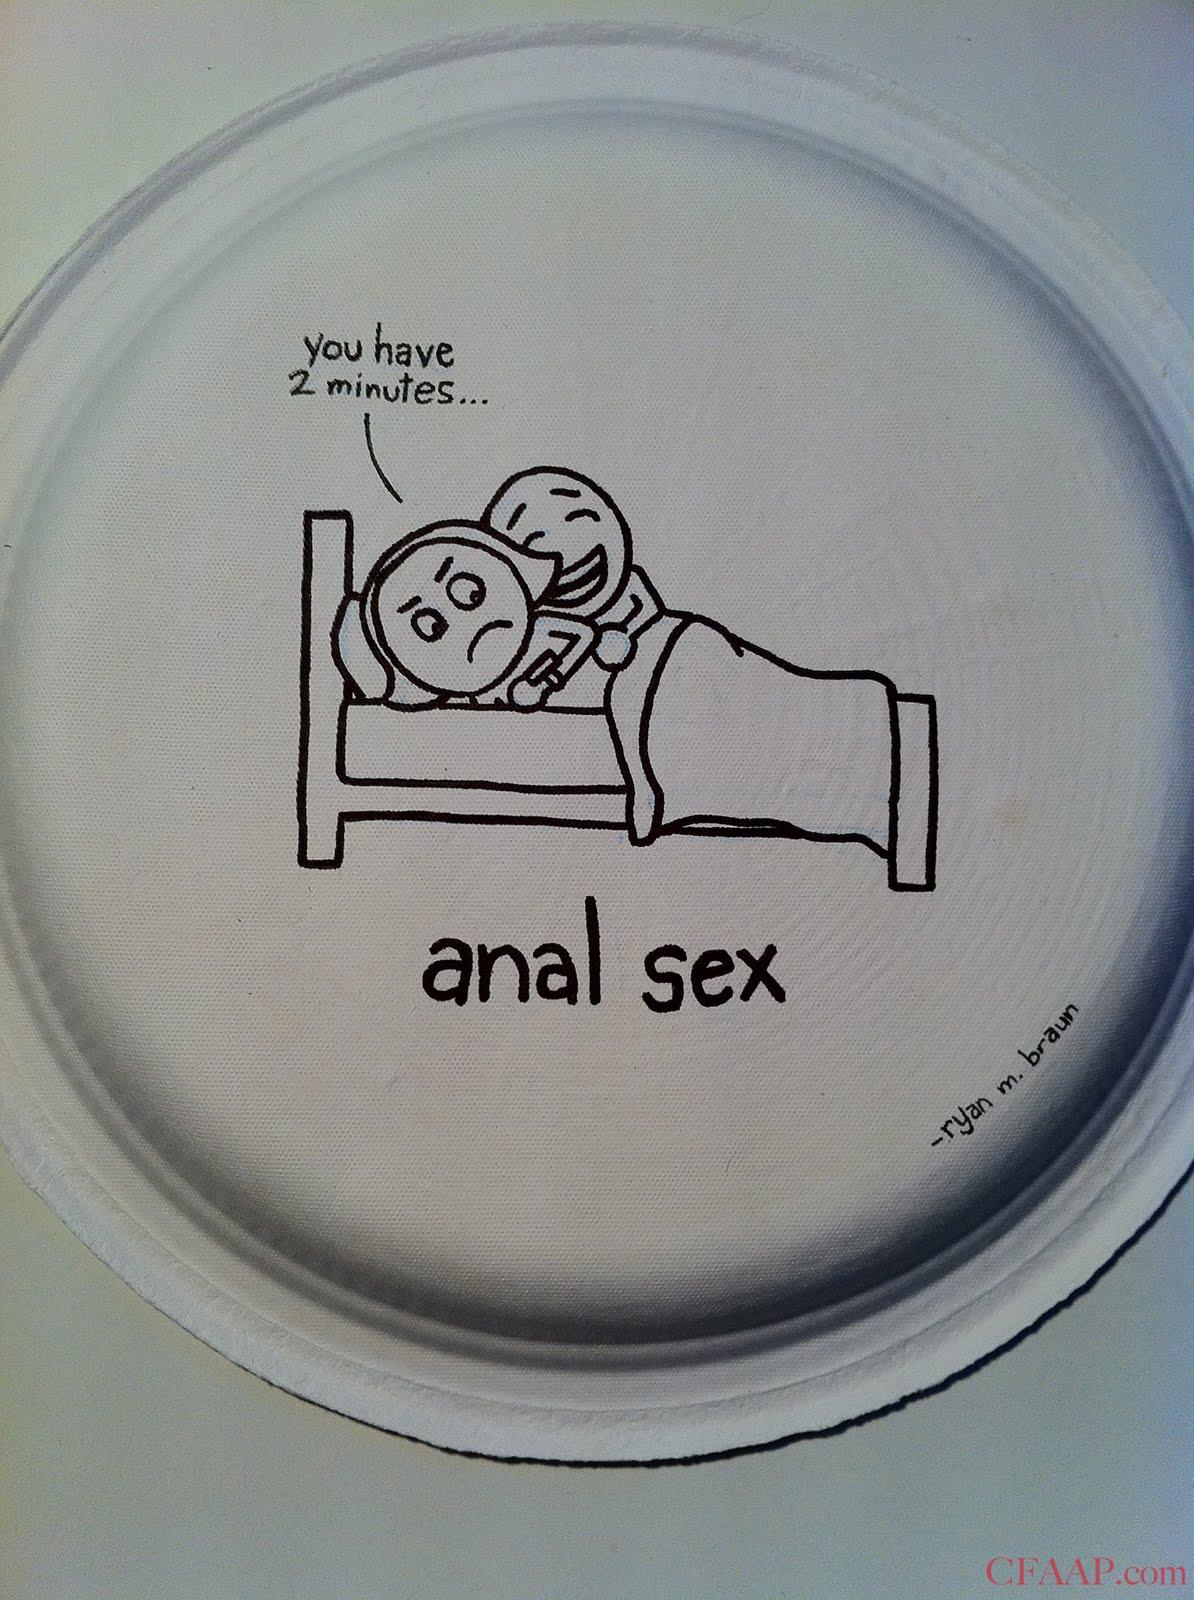 Anal sex quotes cartoons